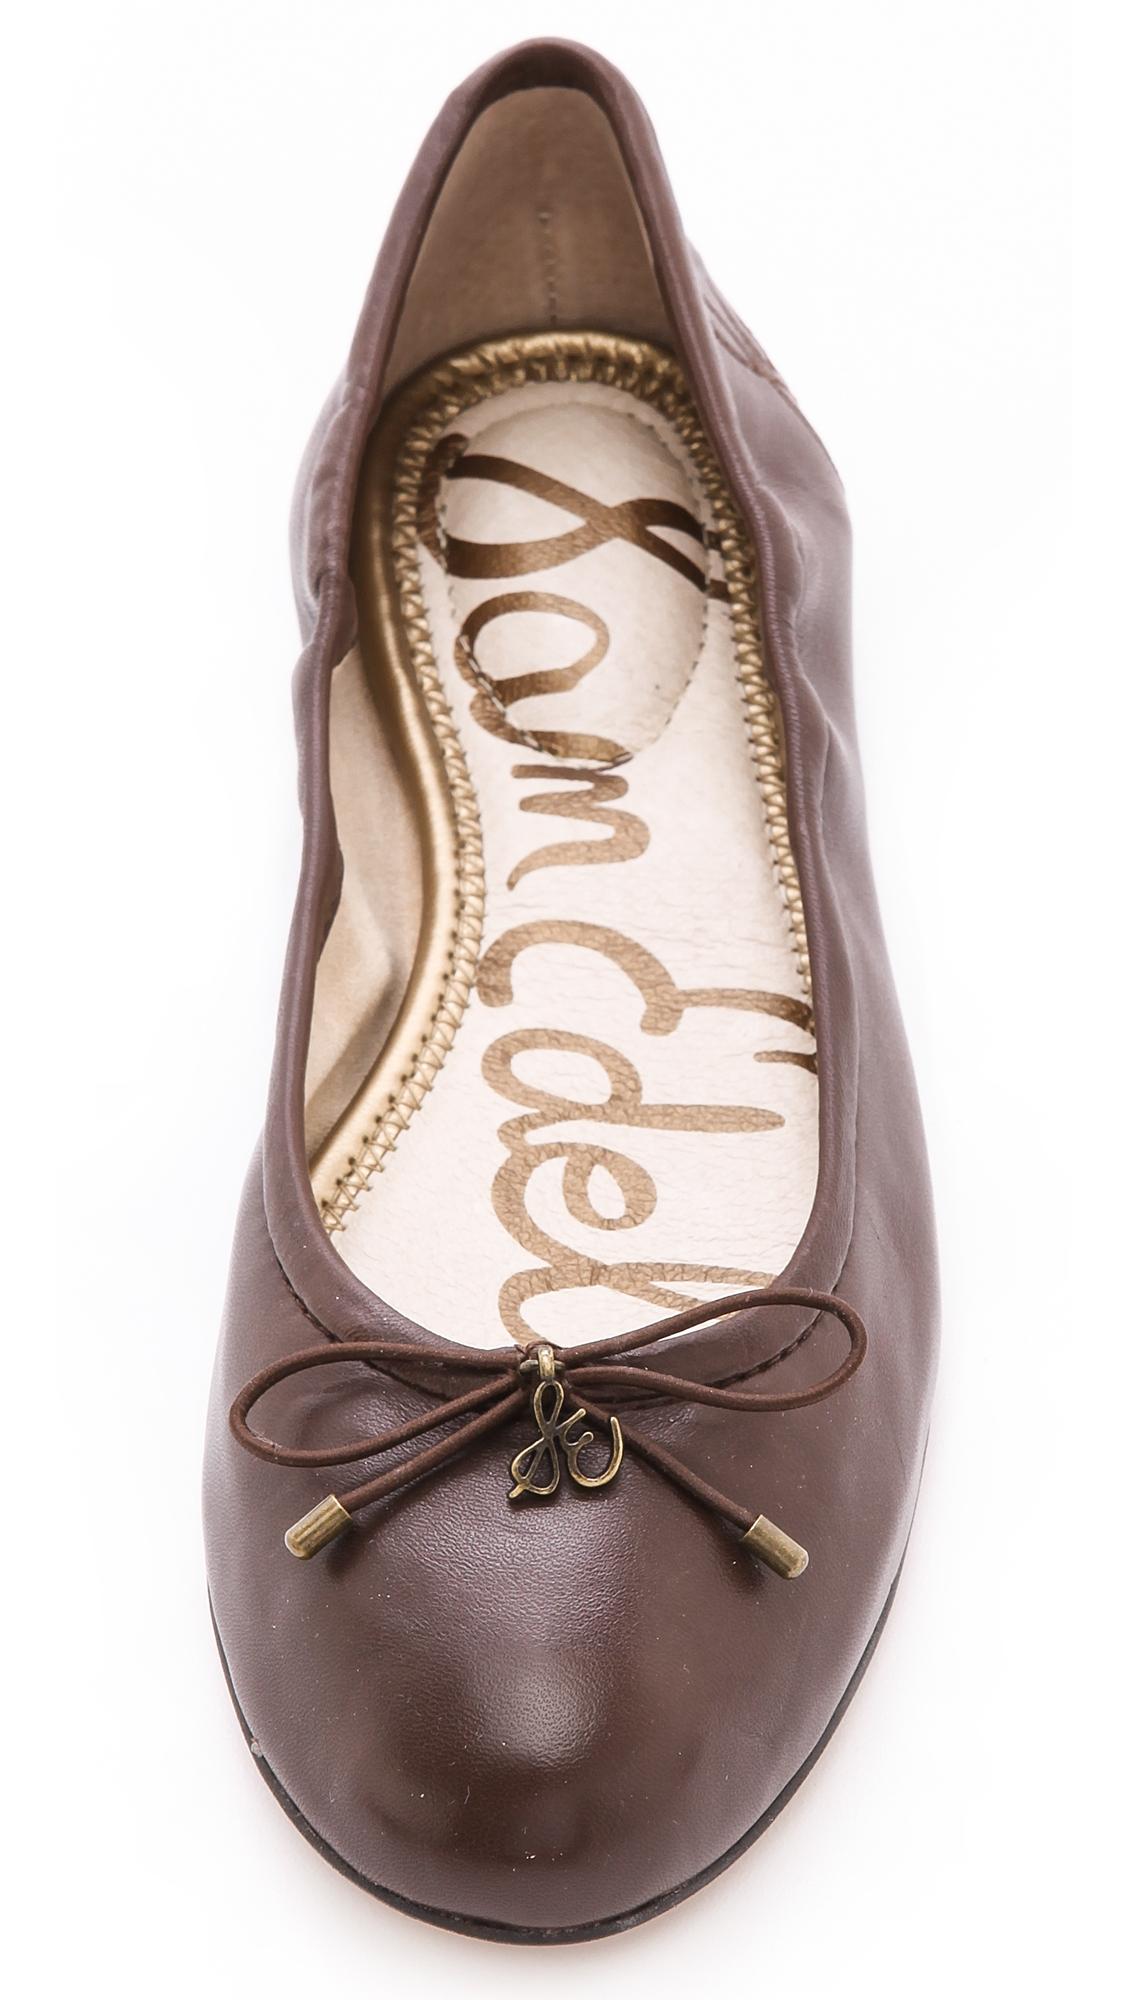 14b8a348a Lyst - Sam Edelman Felicia Ballet Flats - New Burgundy in Brown